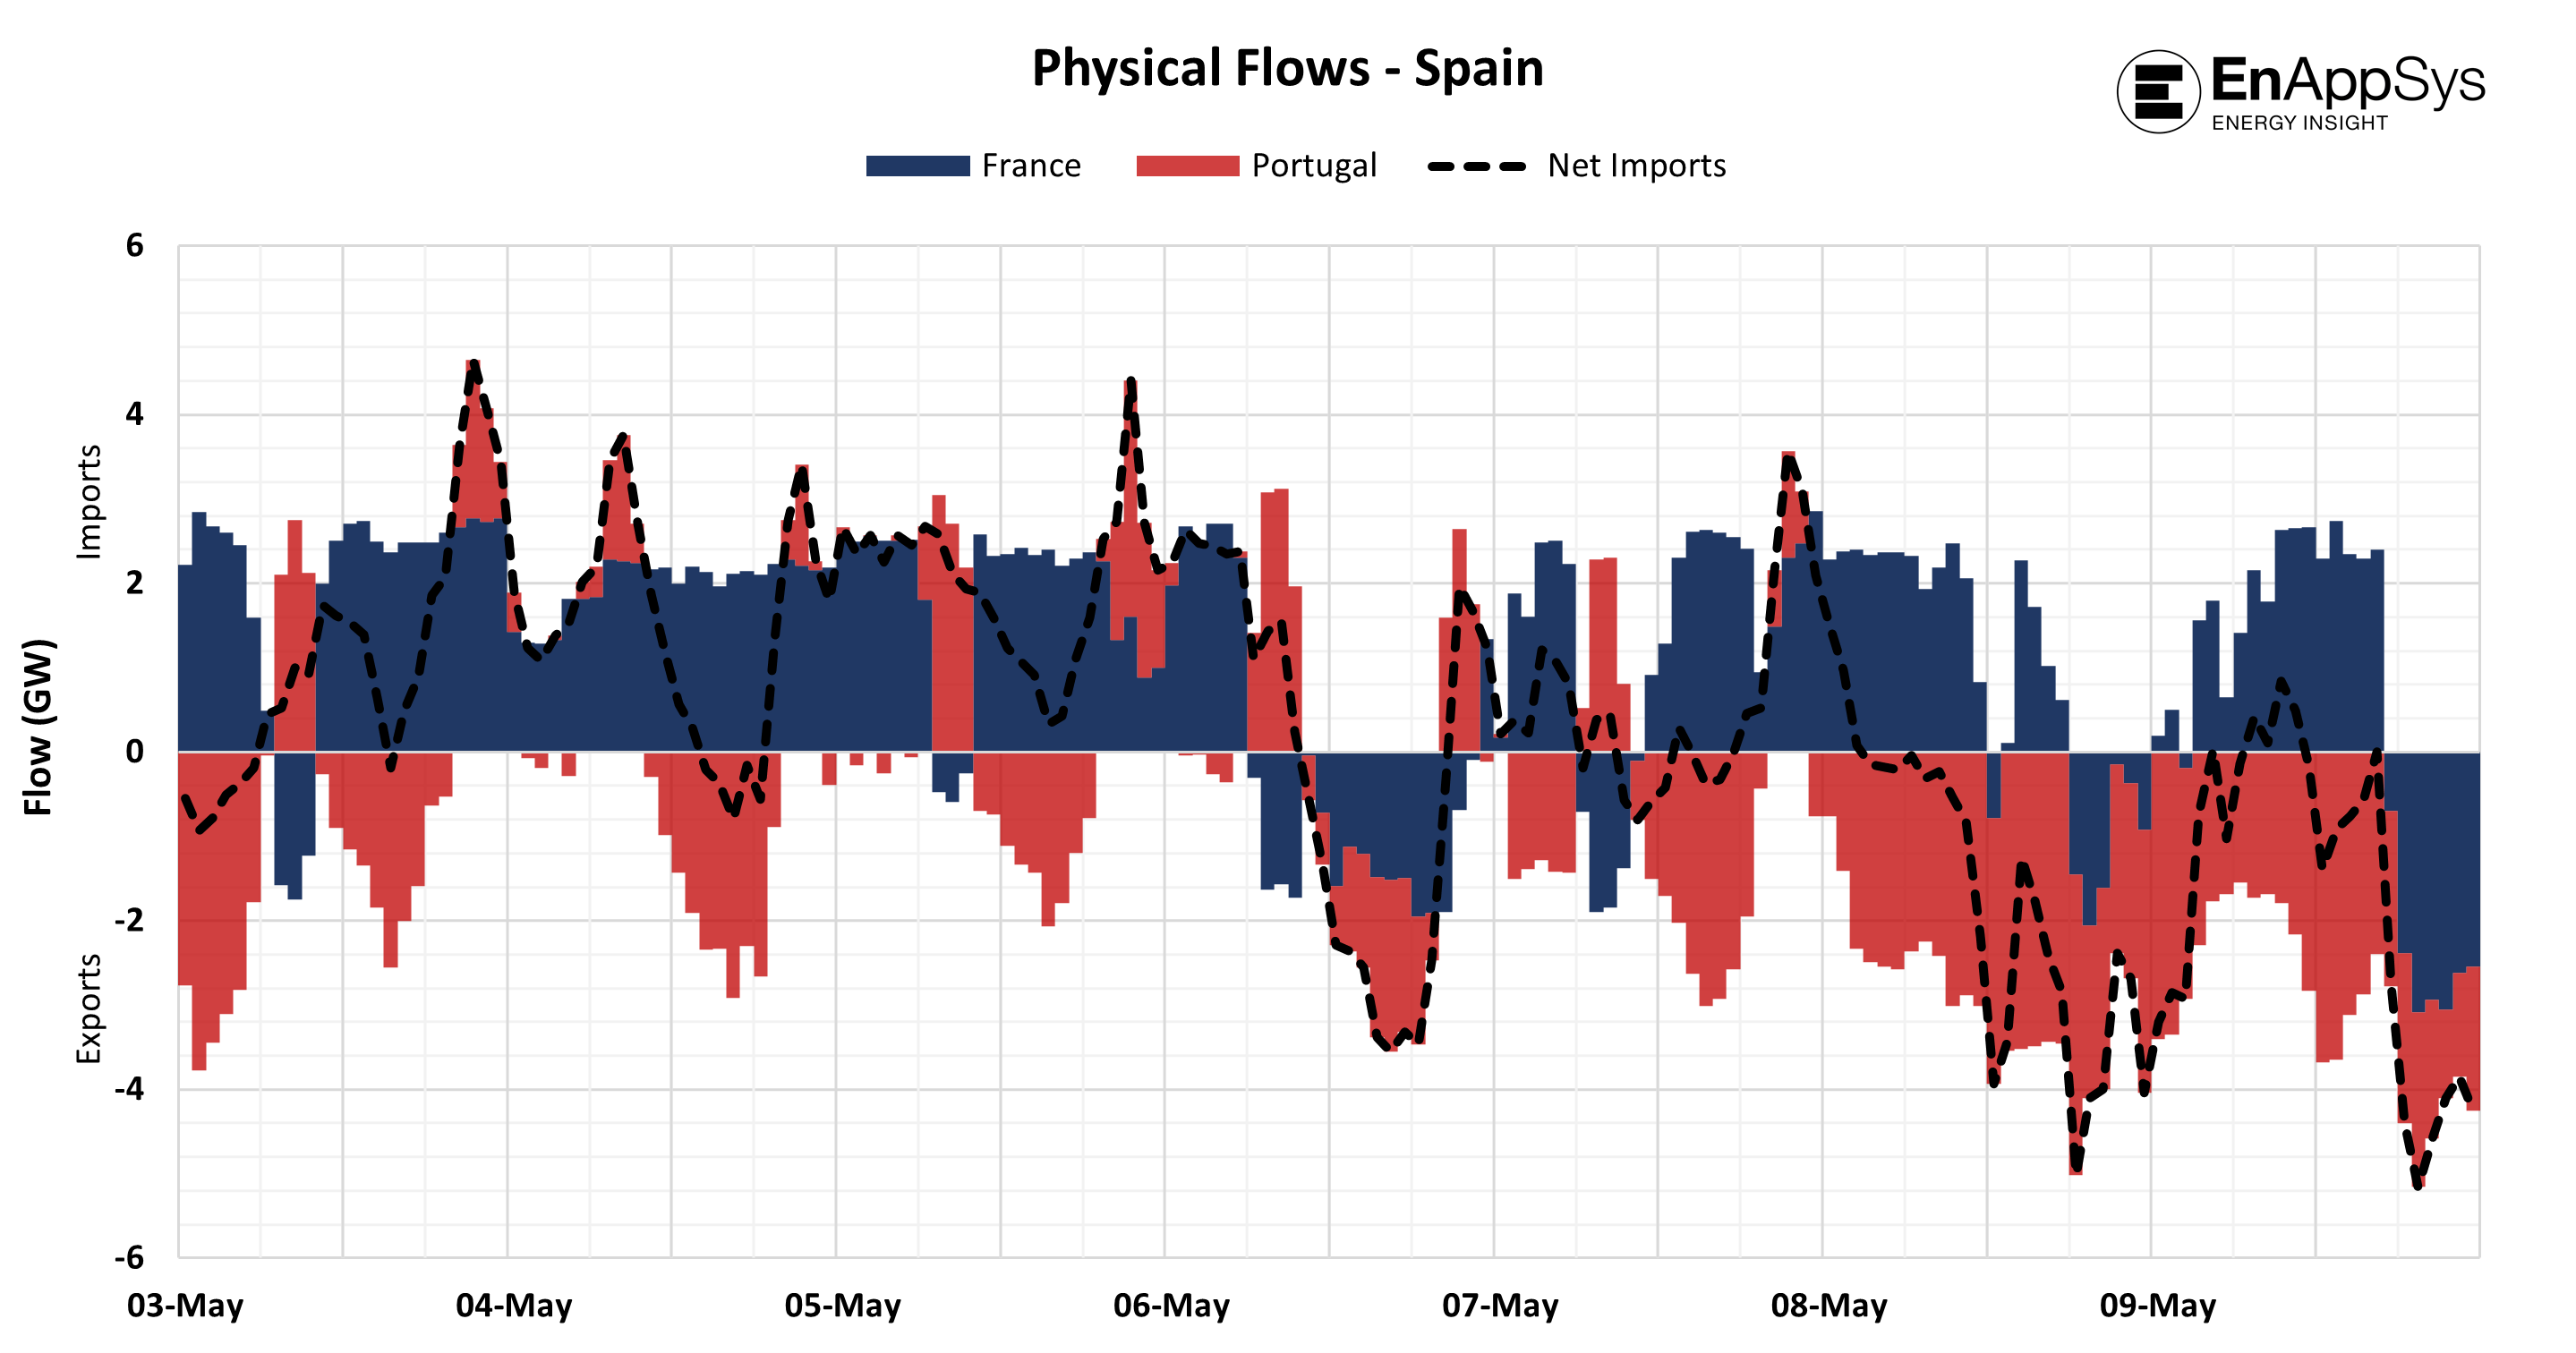 Figure 2 Physical Flows - Spain